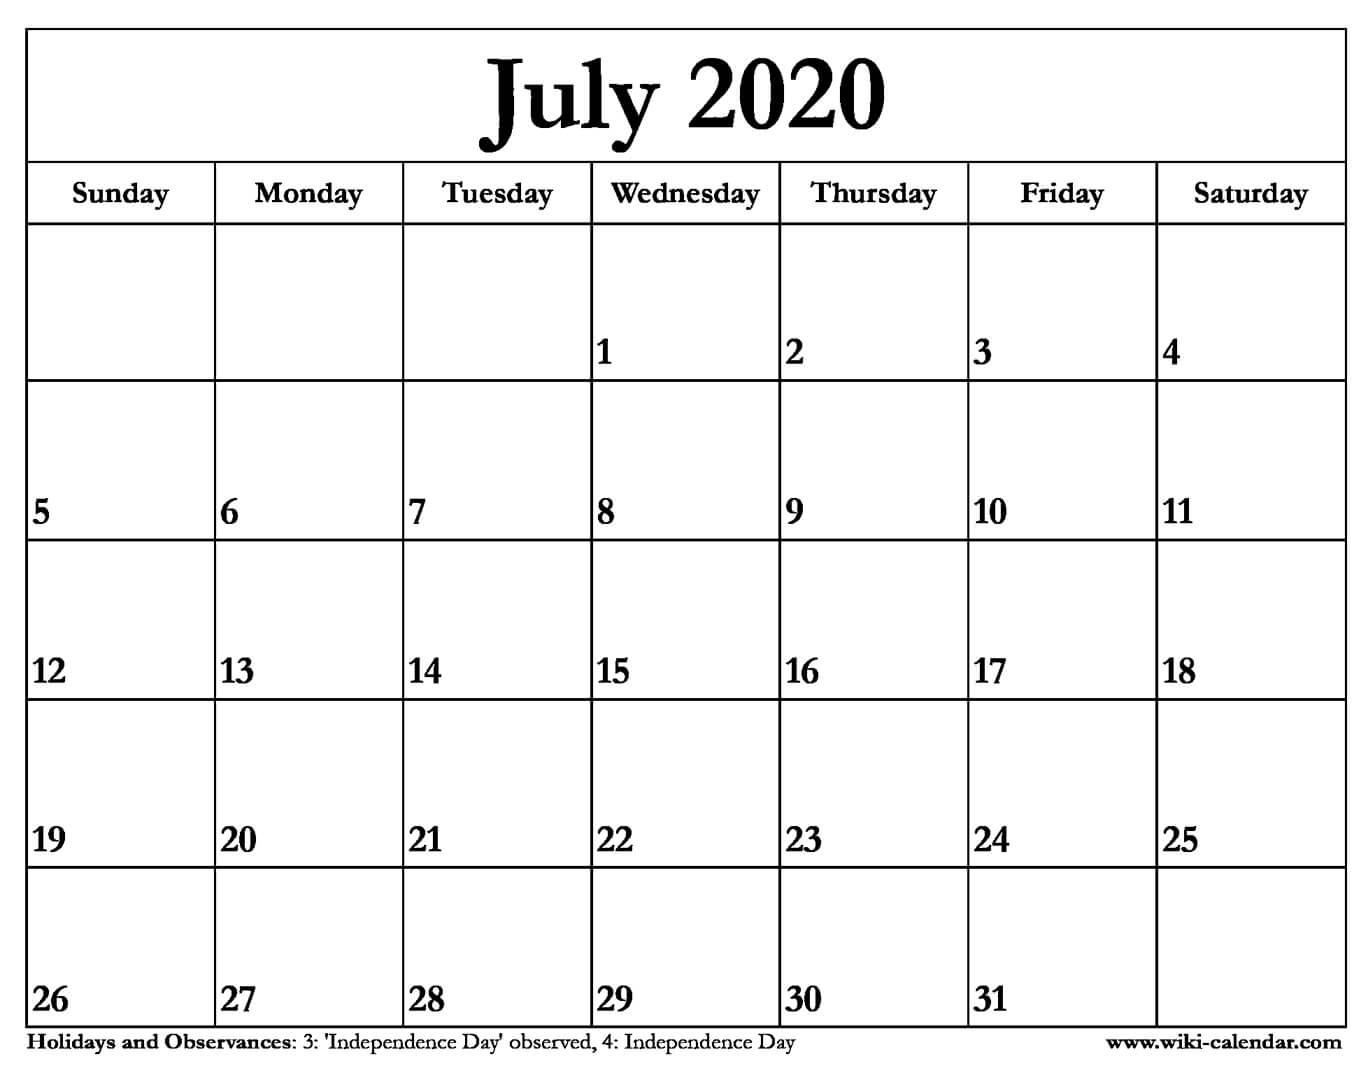 Calendar For 2020 July - Wpa.wpart.co